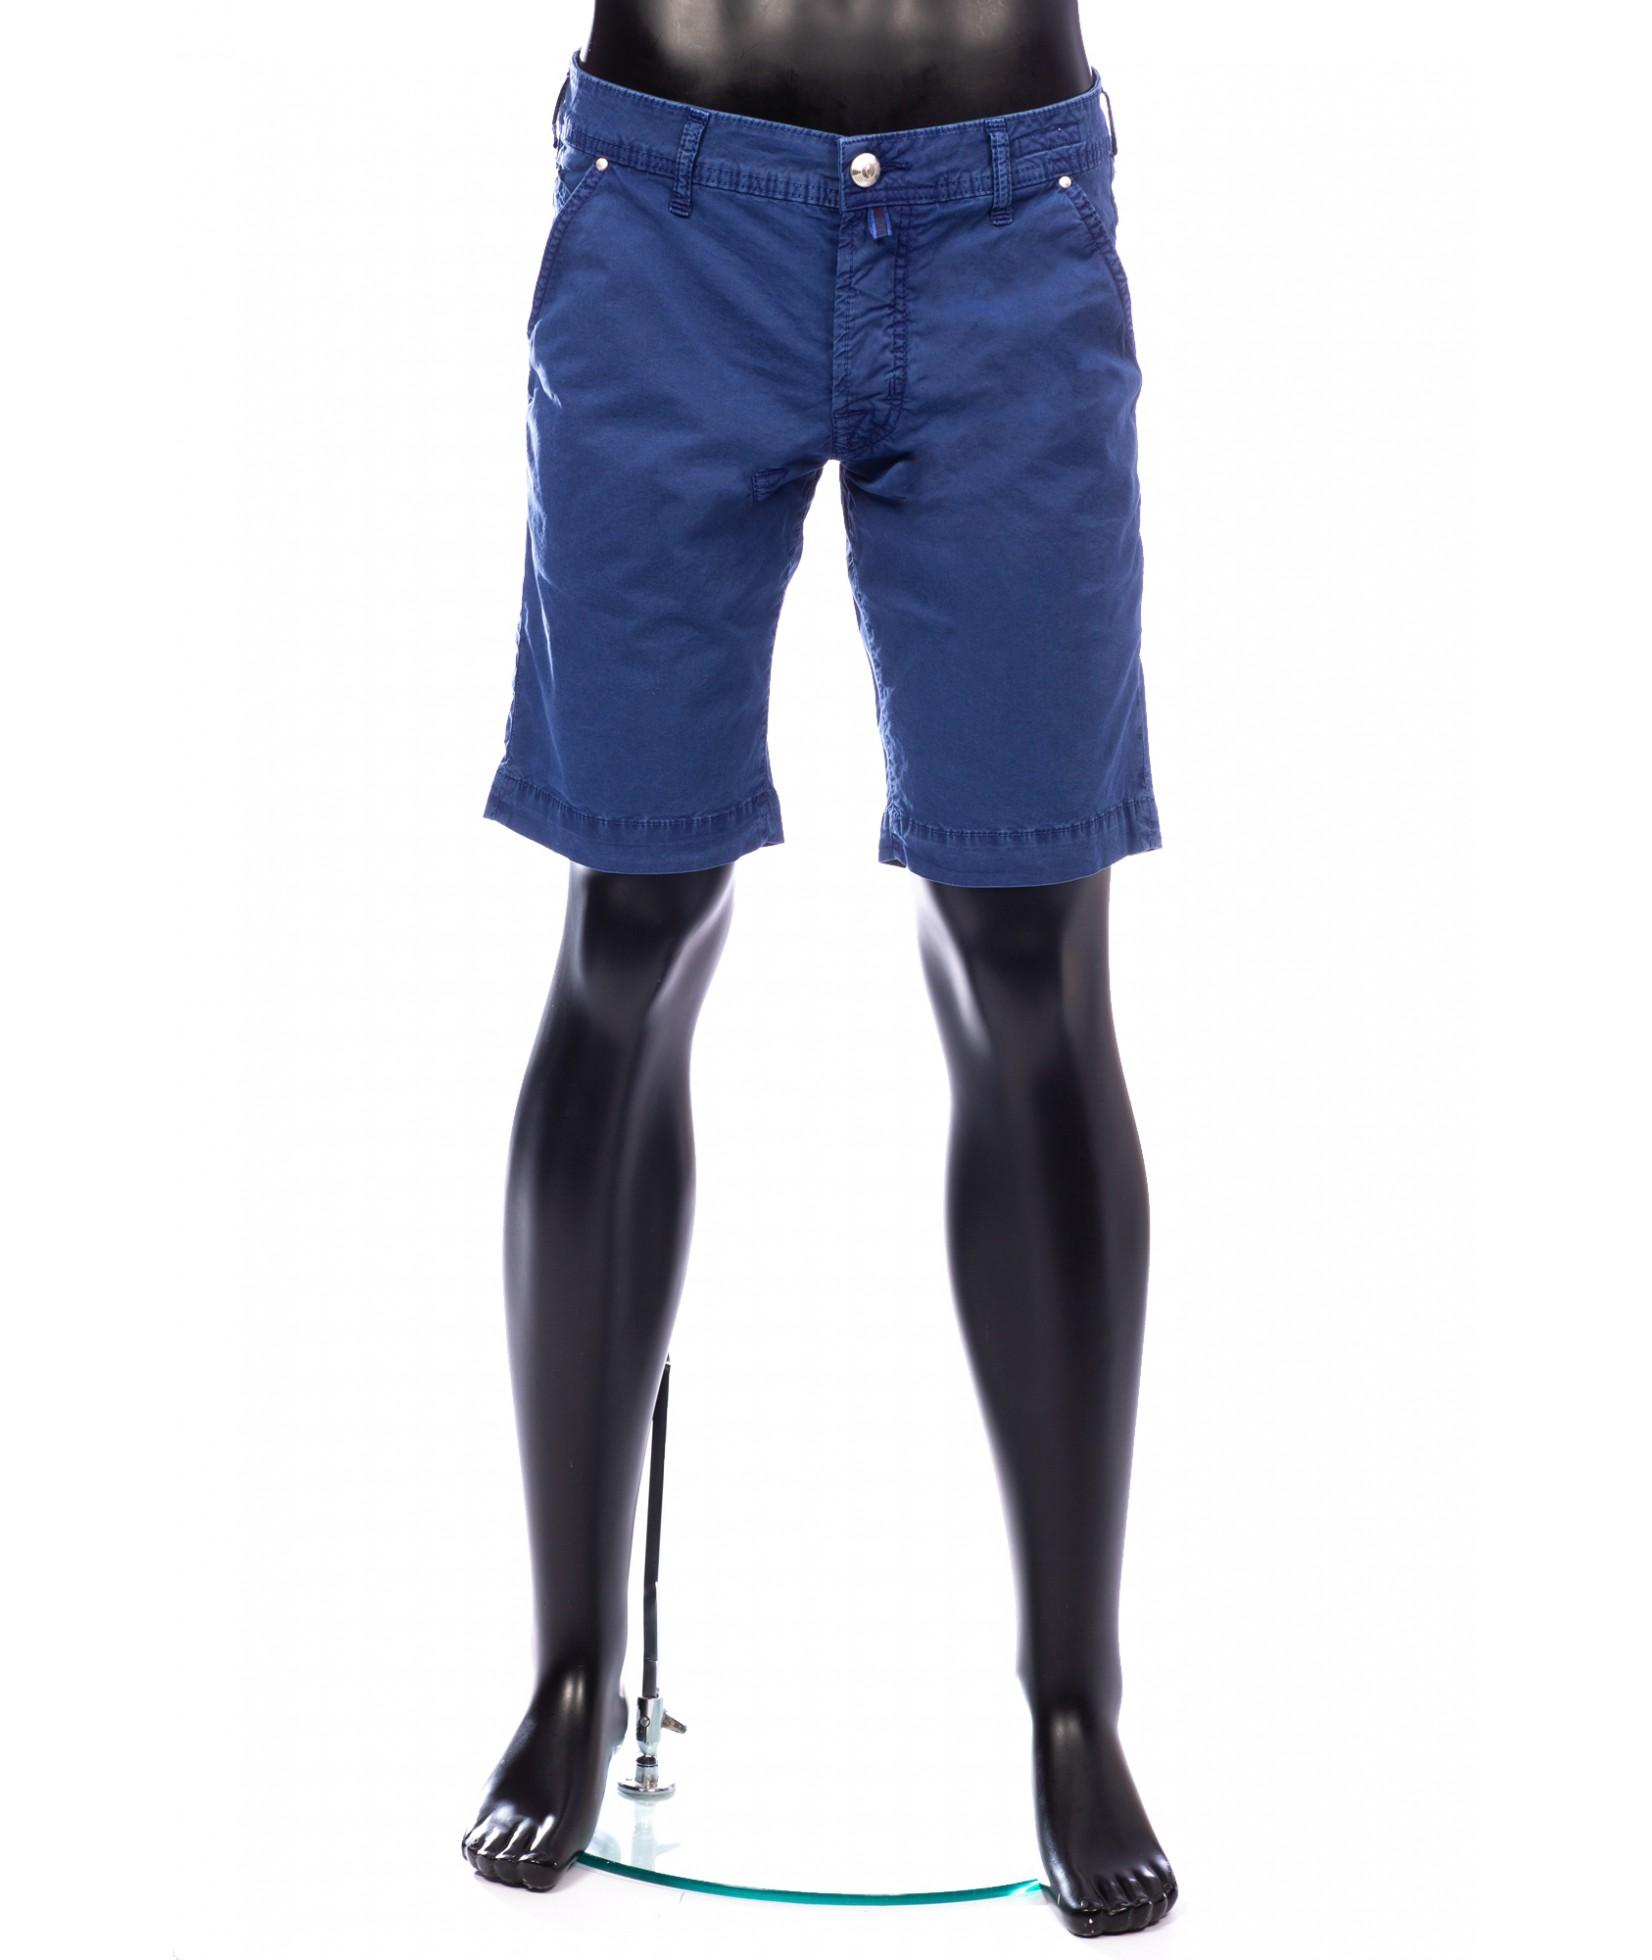 Jacob Cohen J6613 Short Bleu (30391)